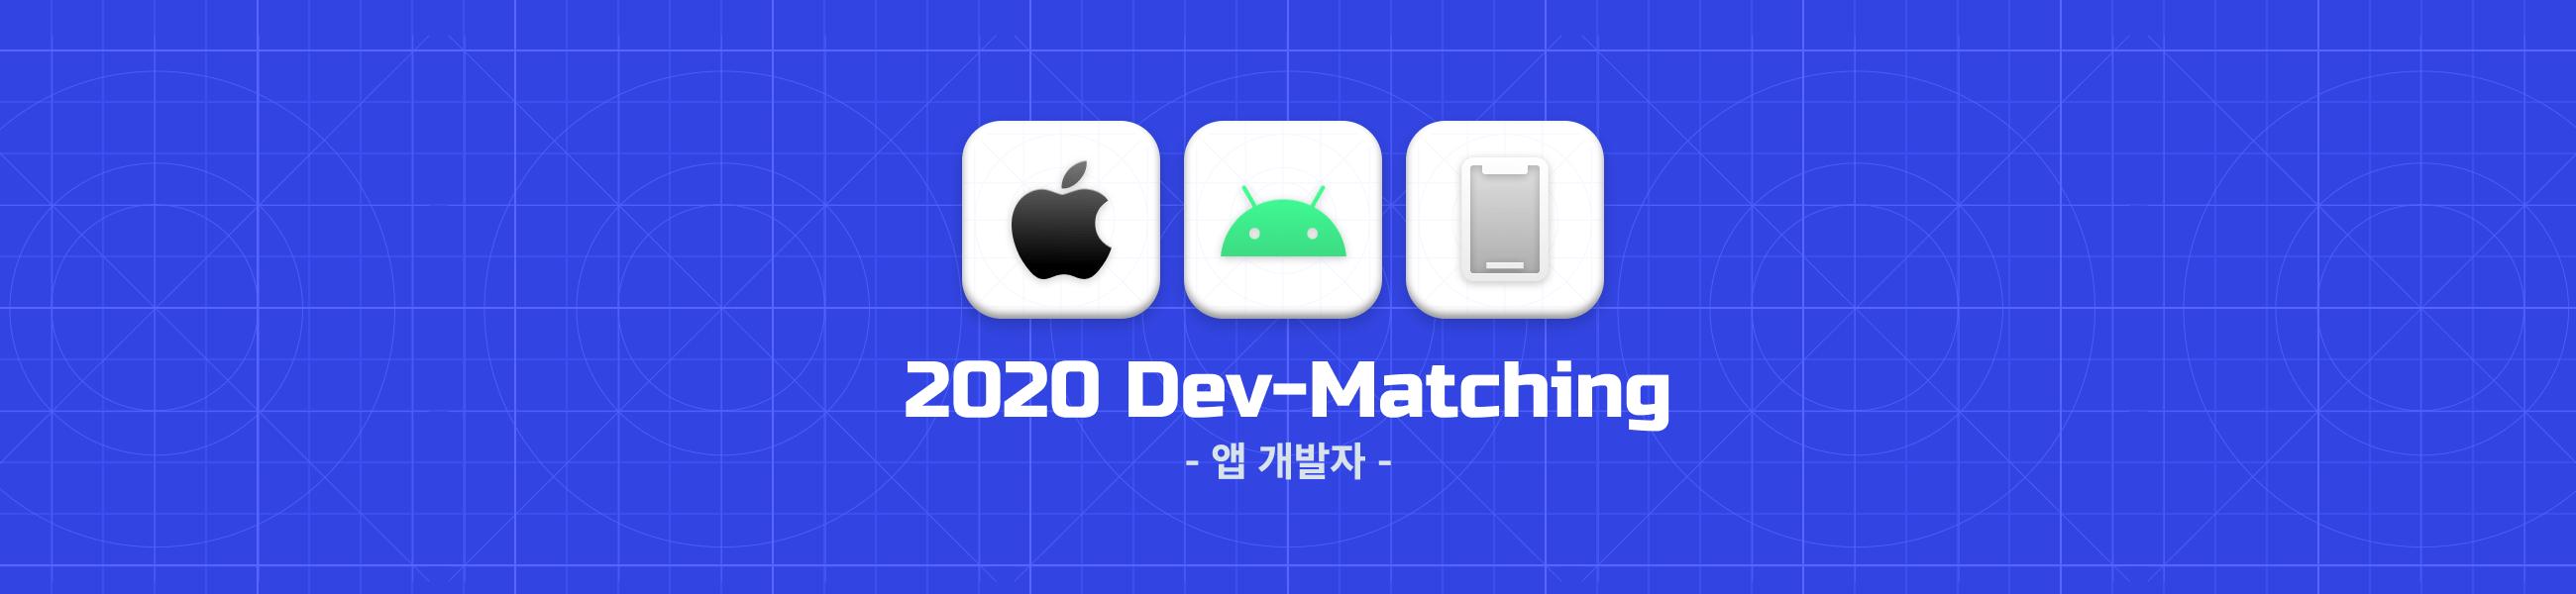 2020 Dev-Matching: 앱 개발자의 이미지